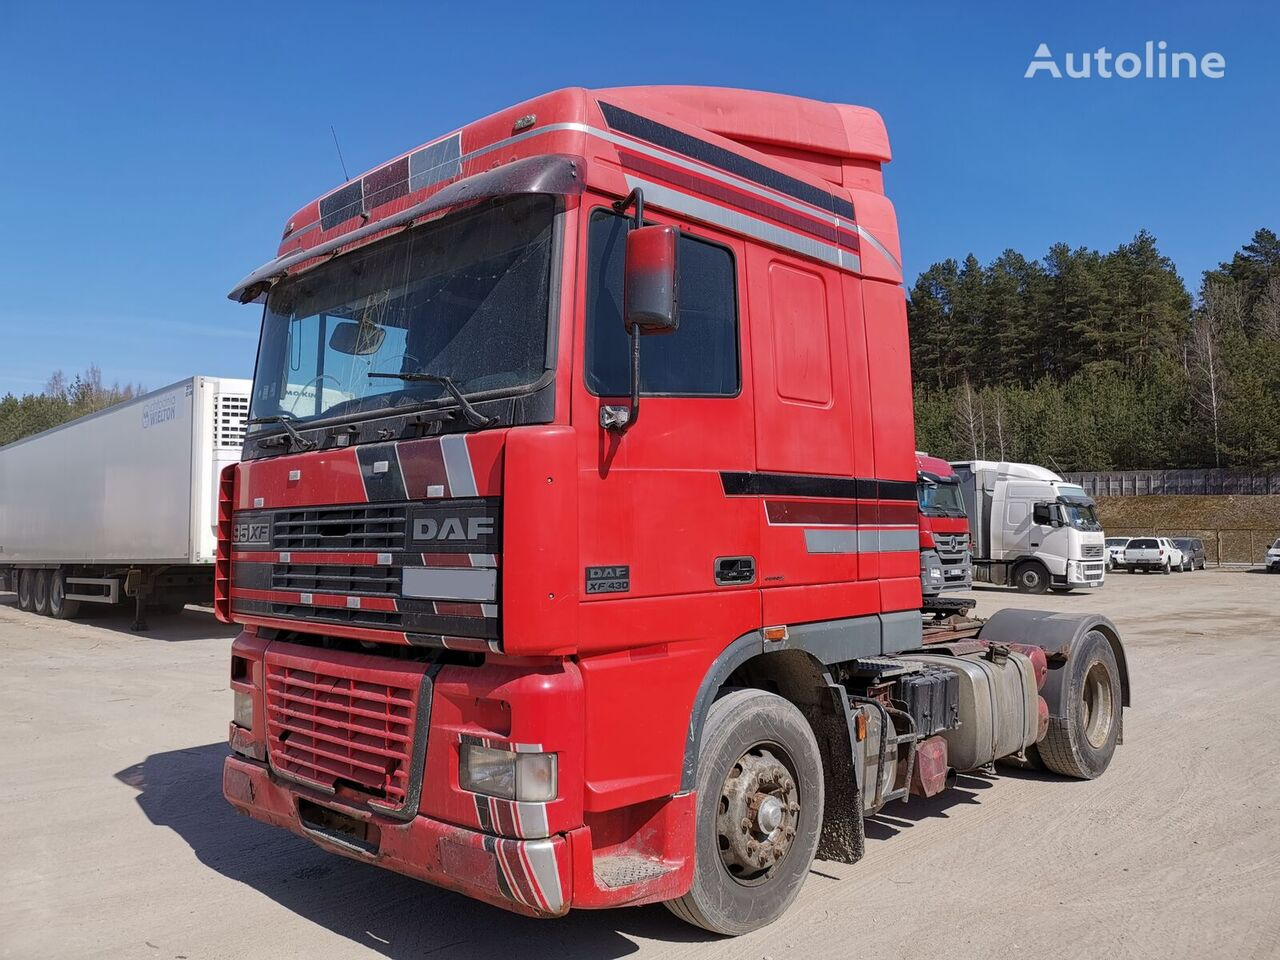 DAF 95.430 tractor unit